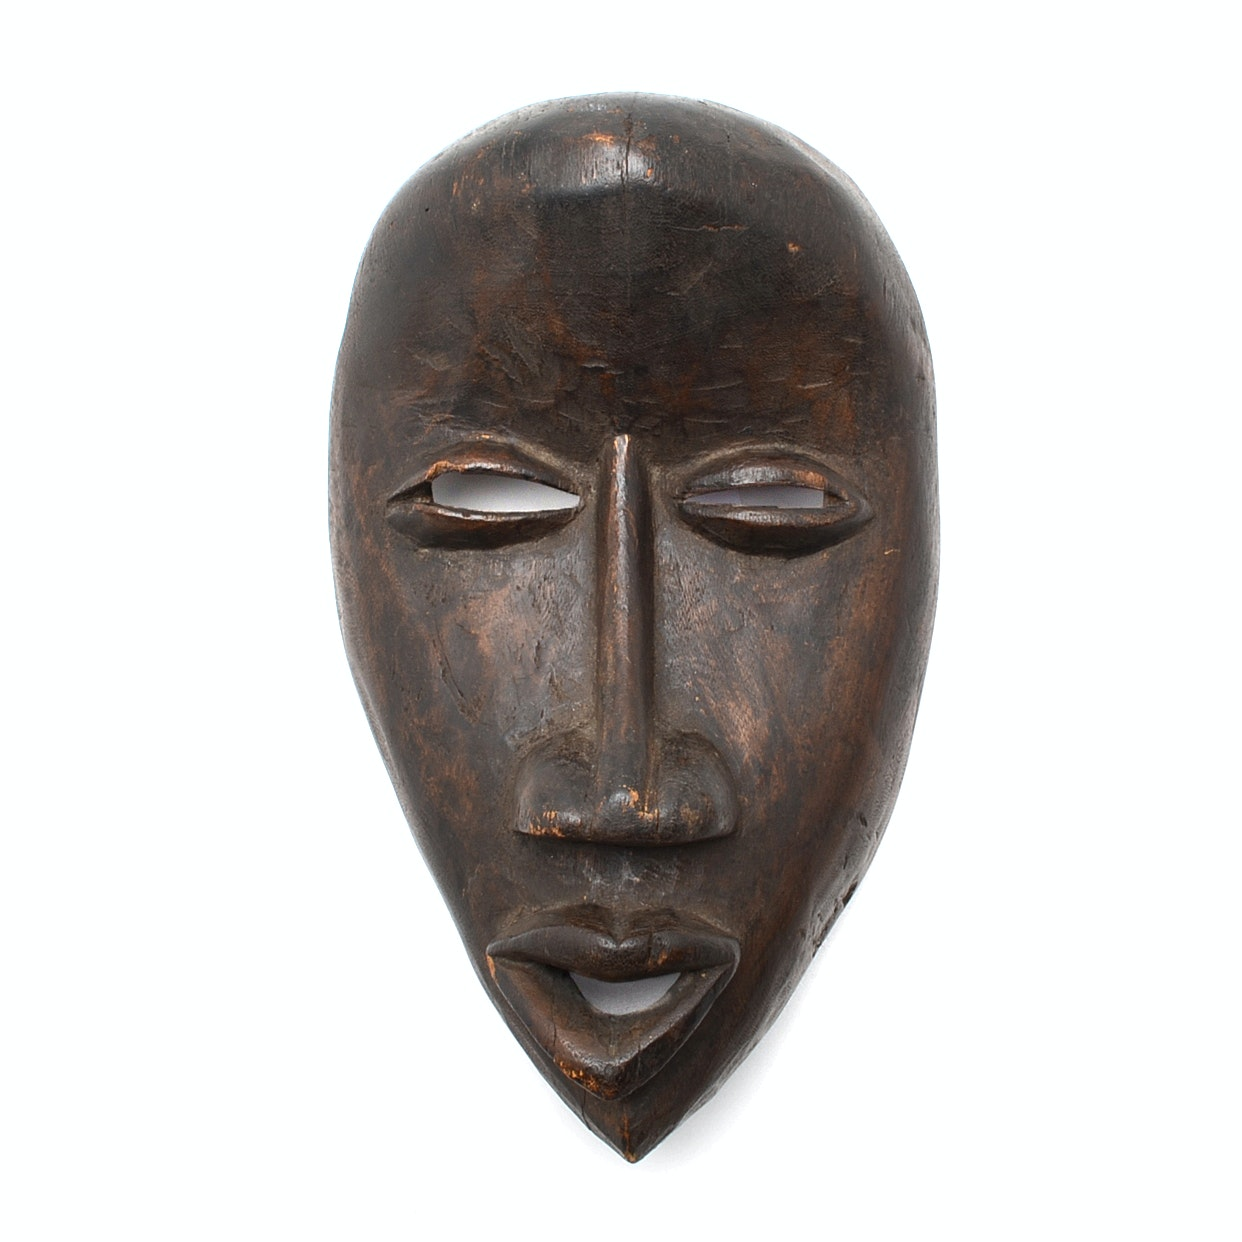 Circa 1900 Nigerian Igbo Carved Mask